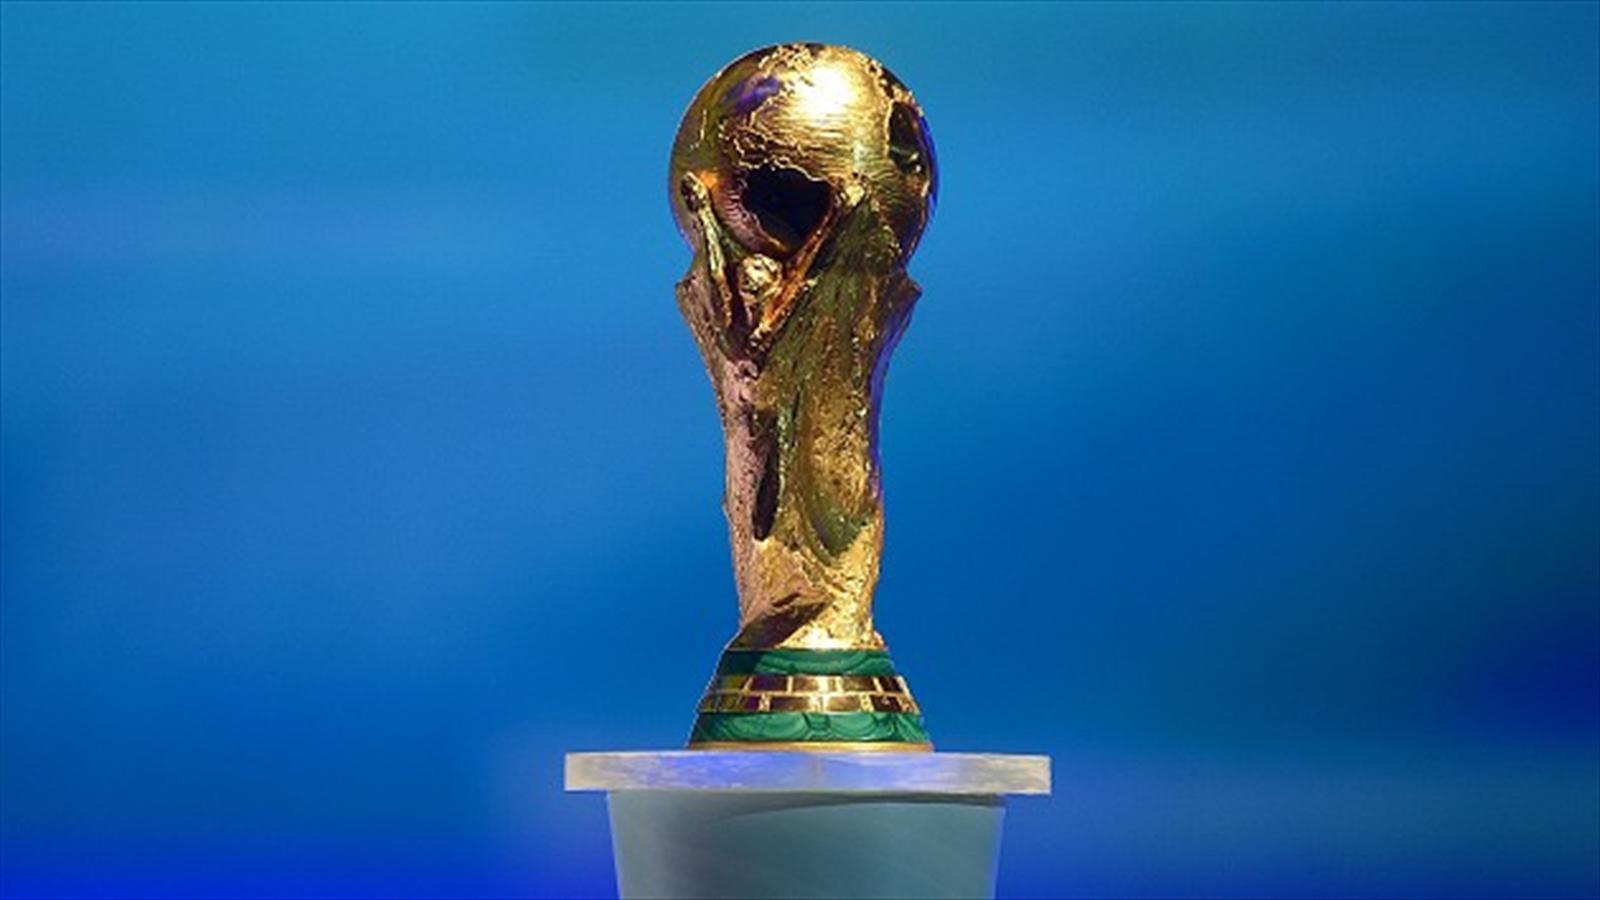 Кубок мира по футболу в картинках